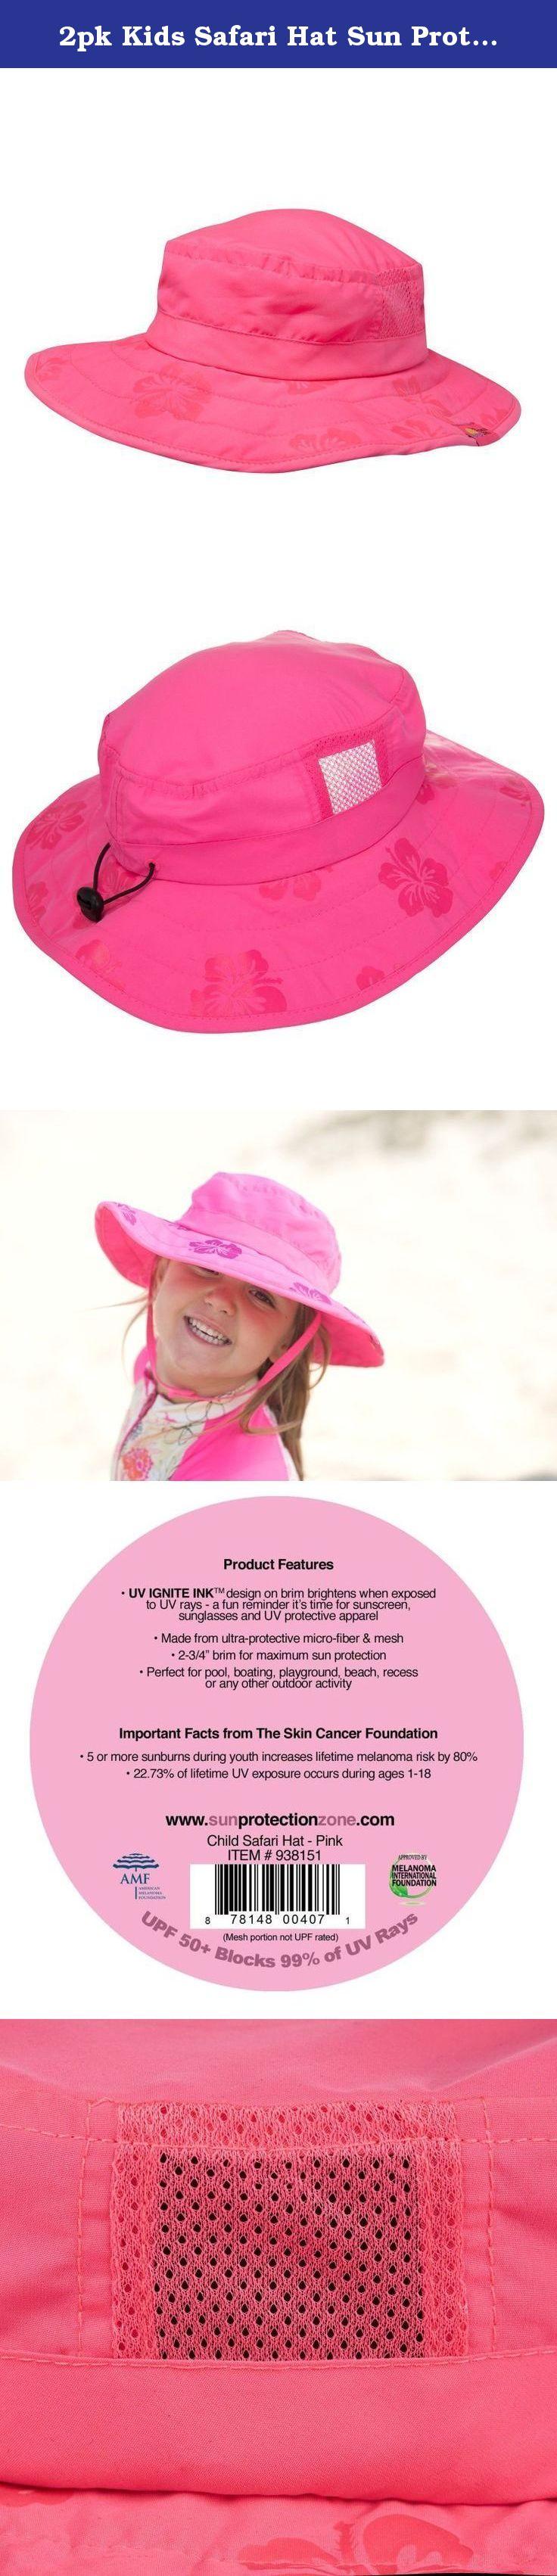 1be1ad7bbead7 2pk Kids Safari Hat Sun Protective Zone UPF 50+ Child Block UV Rays Shade  938151